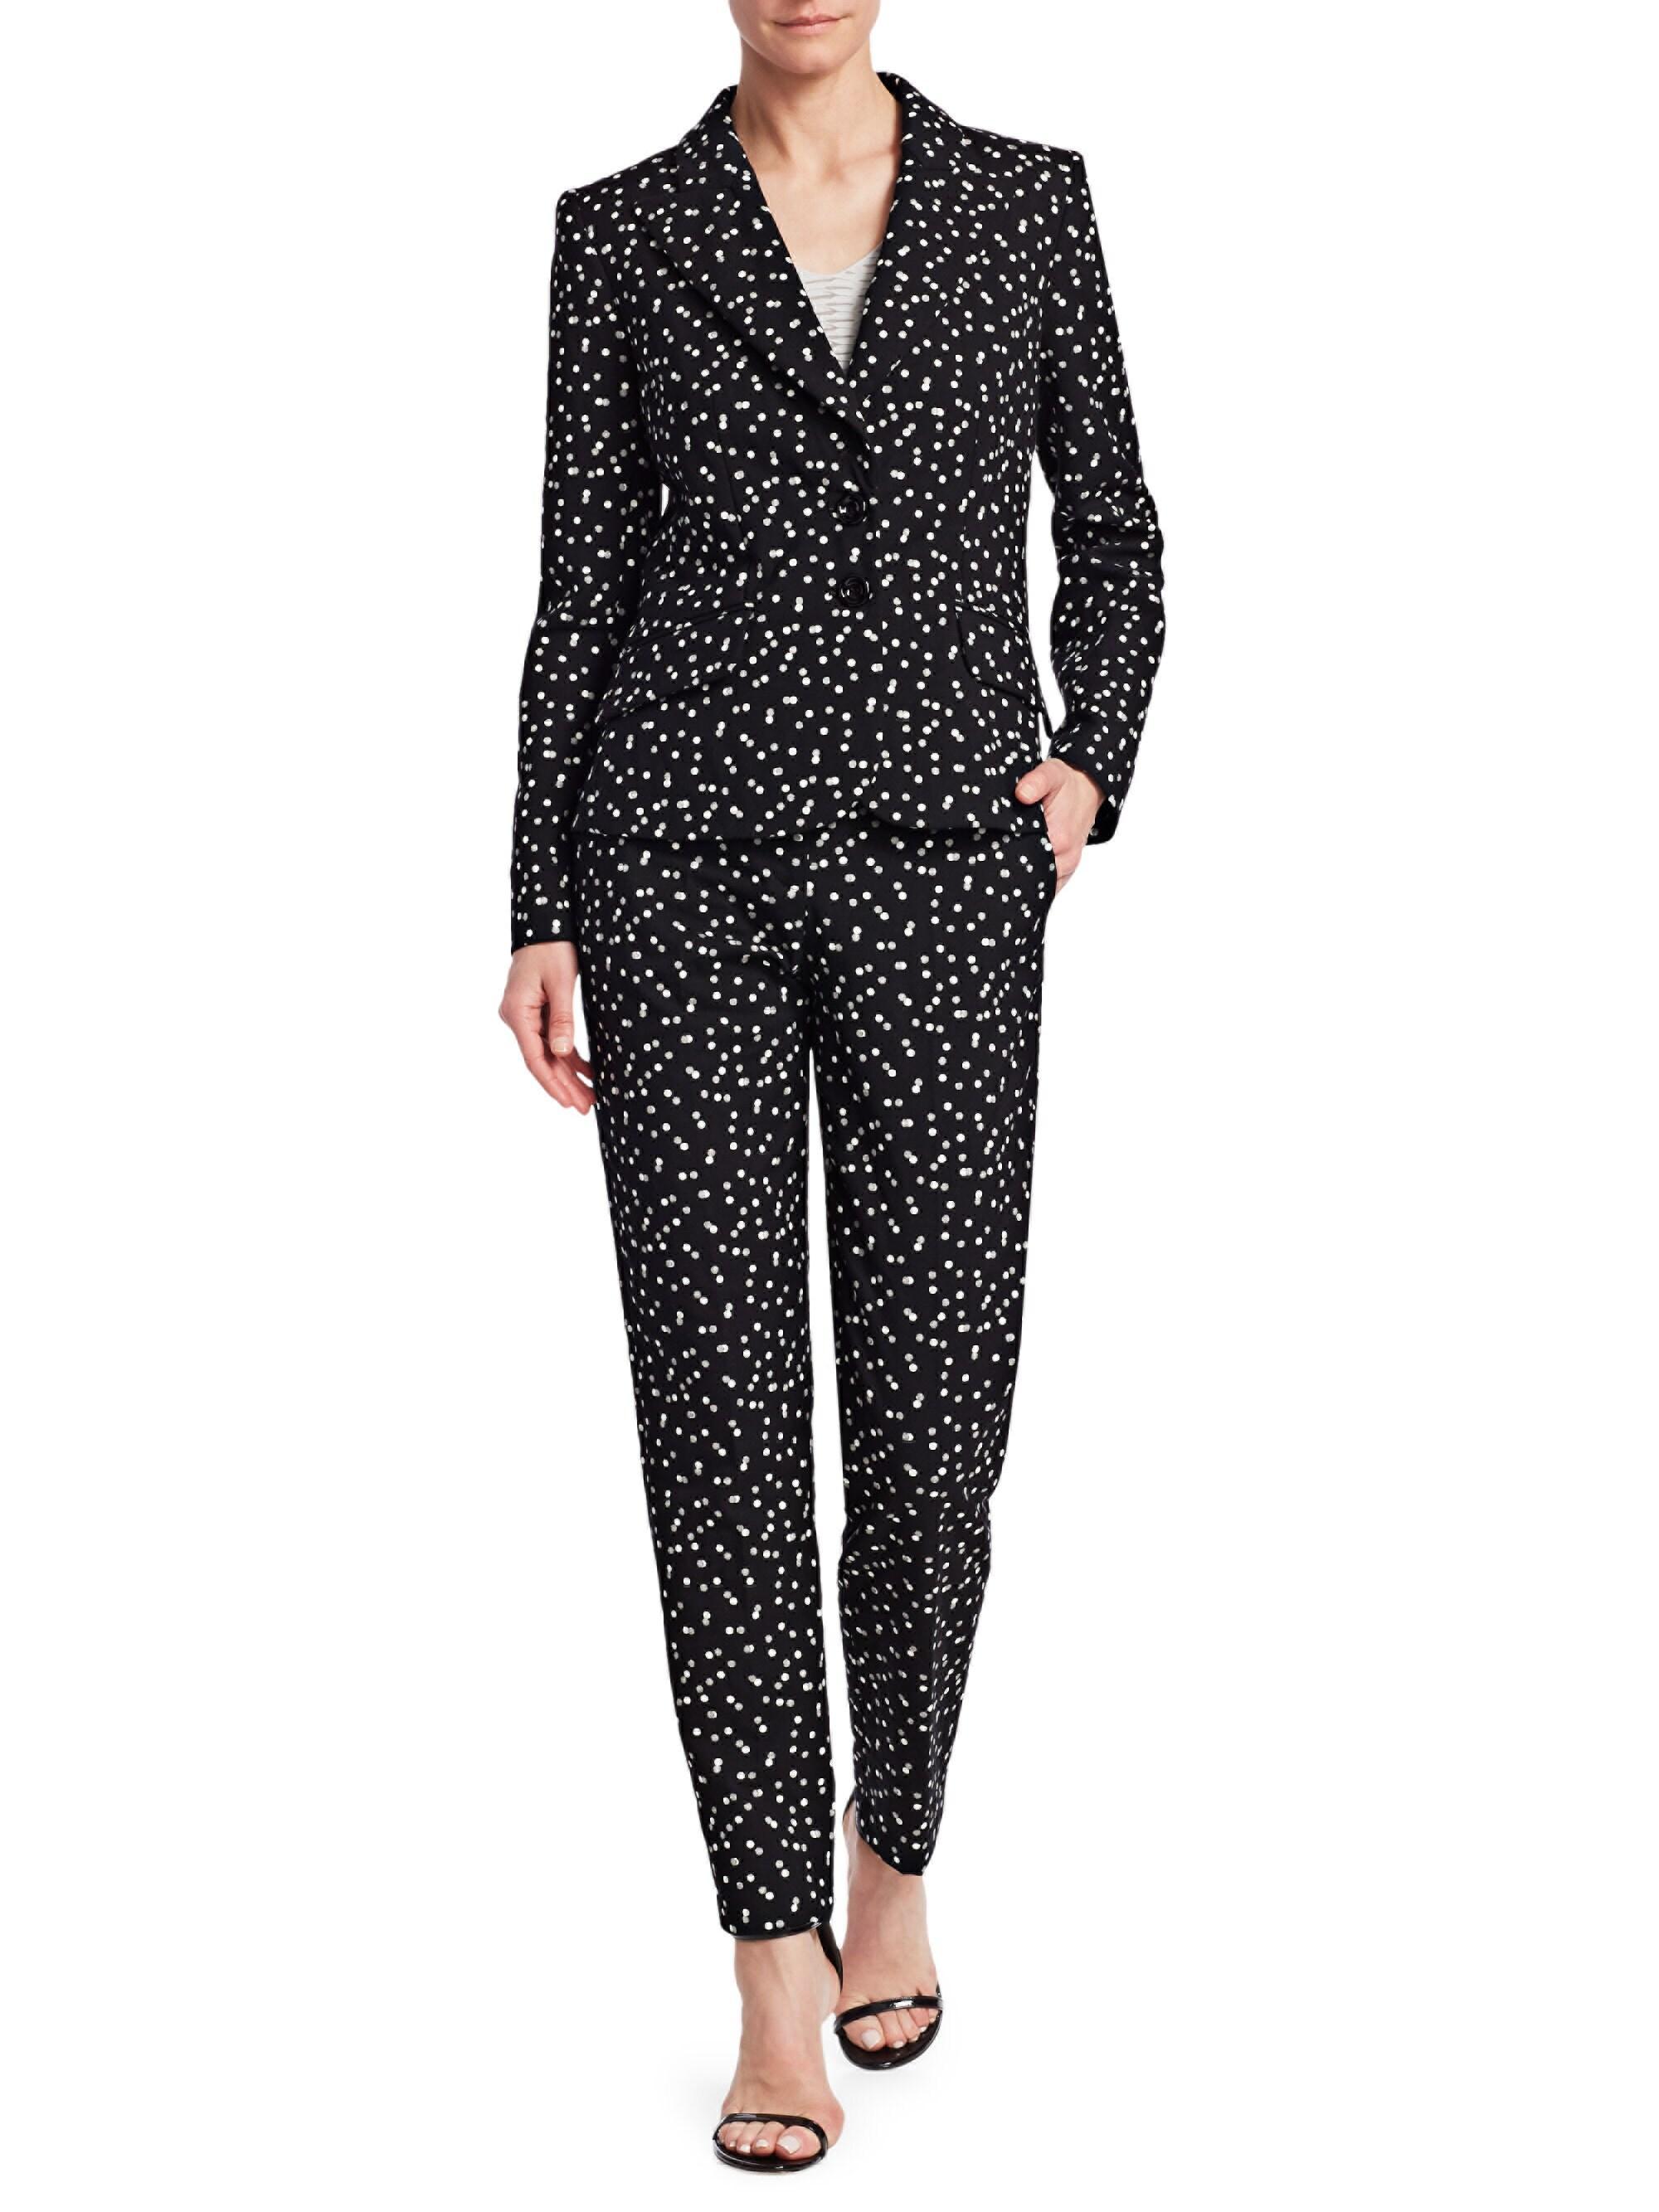 f5589fdf8f Emporio Armani Women's Polka Dot Stretch Cotton Blazer in Black - Lyst